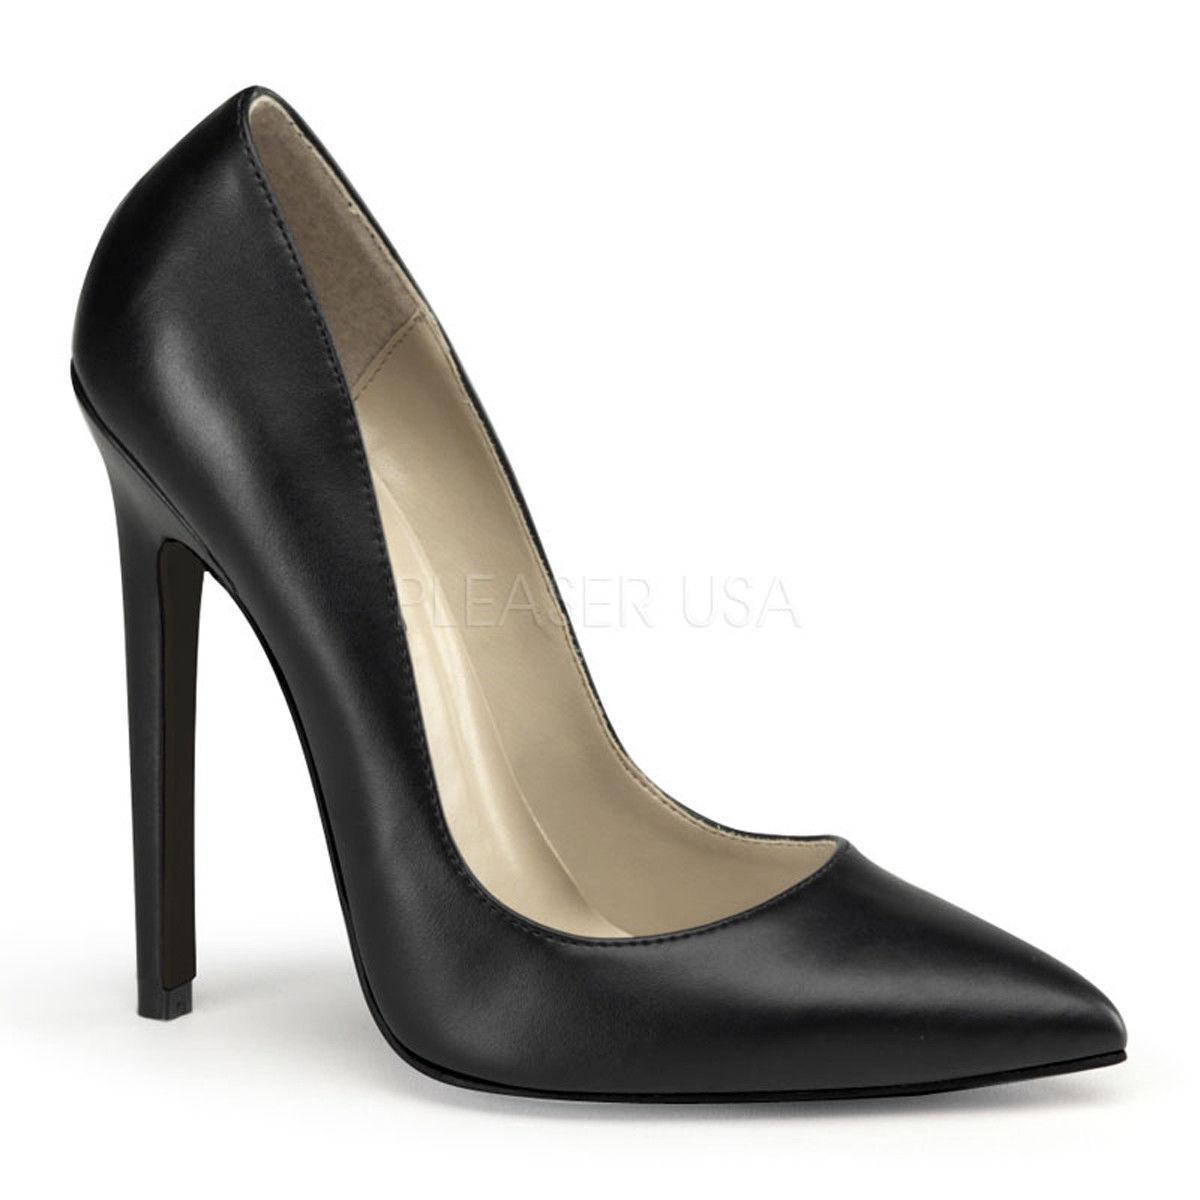 14 cm Sexy black Black faux leather UK7 40 fetish sky pumps sandals high heels